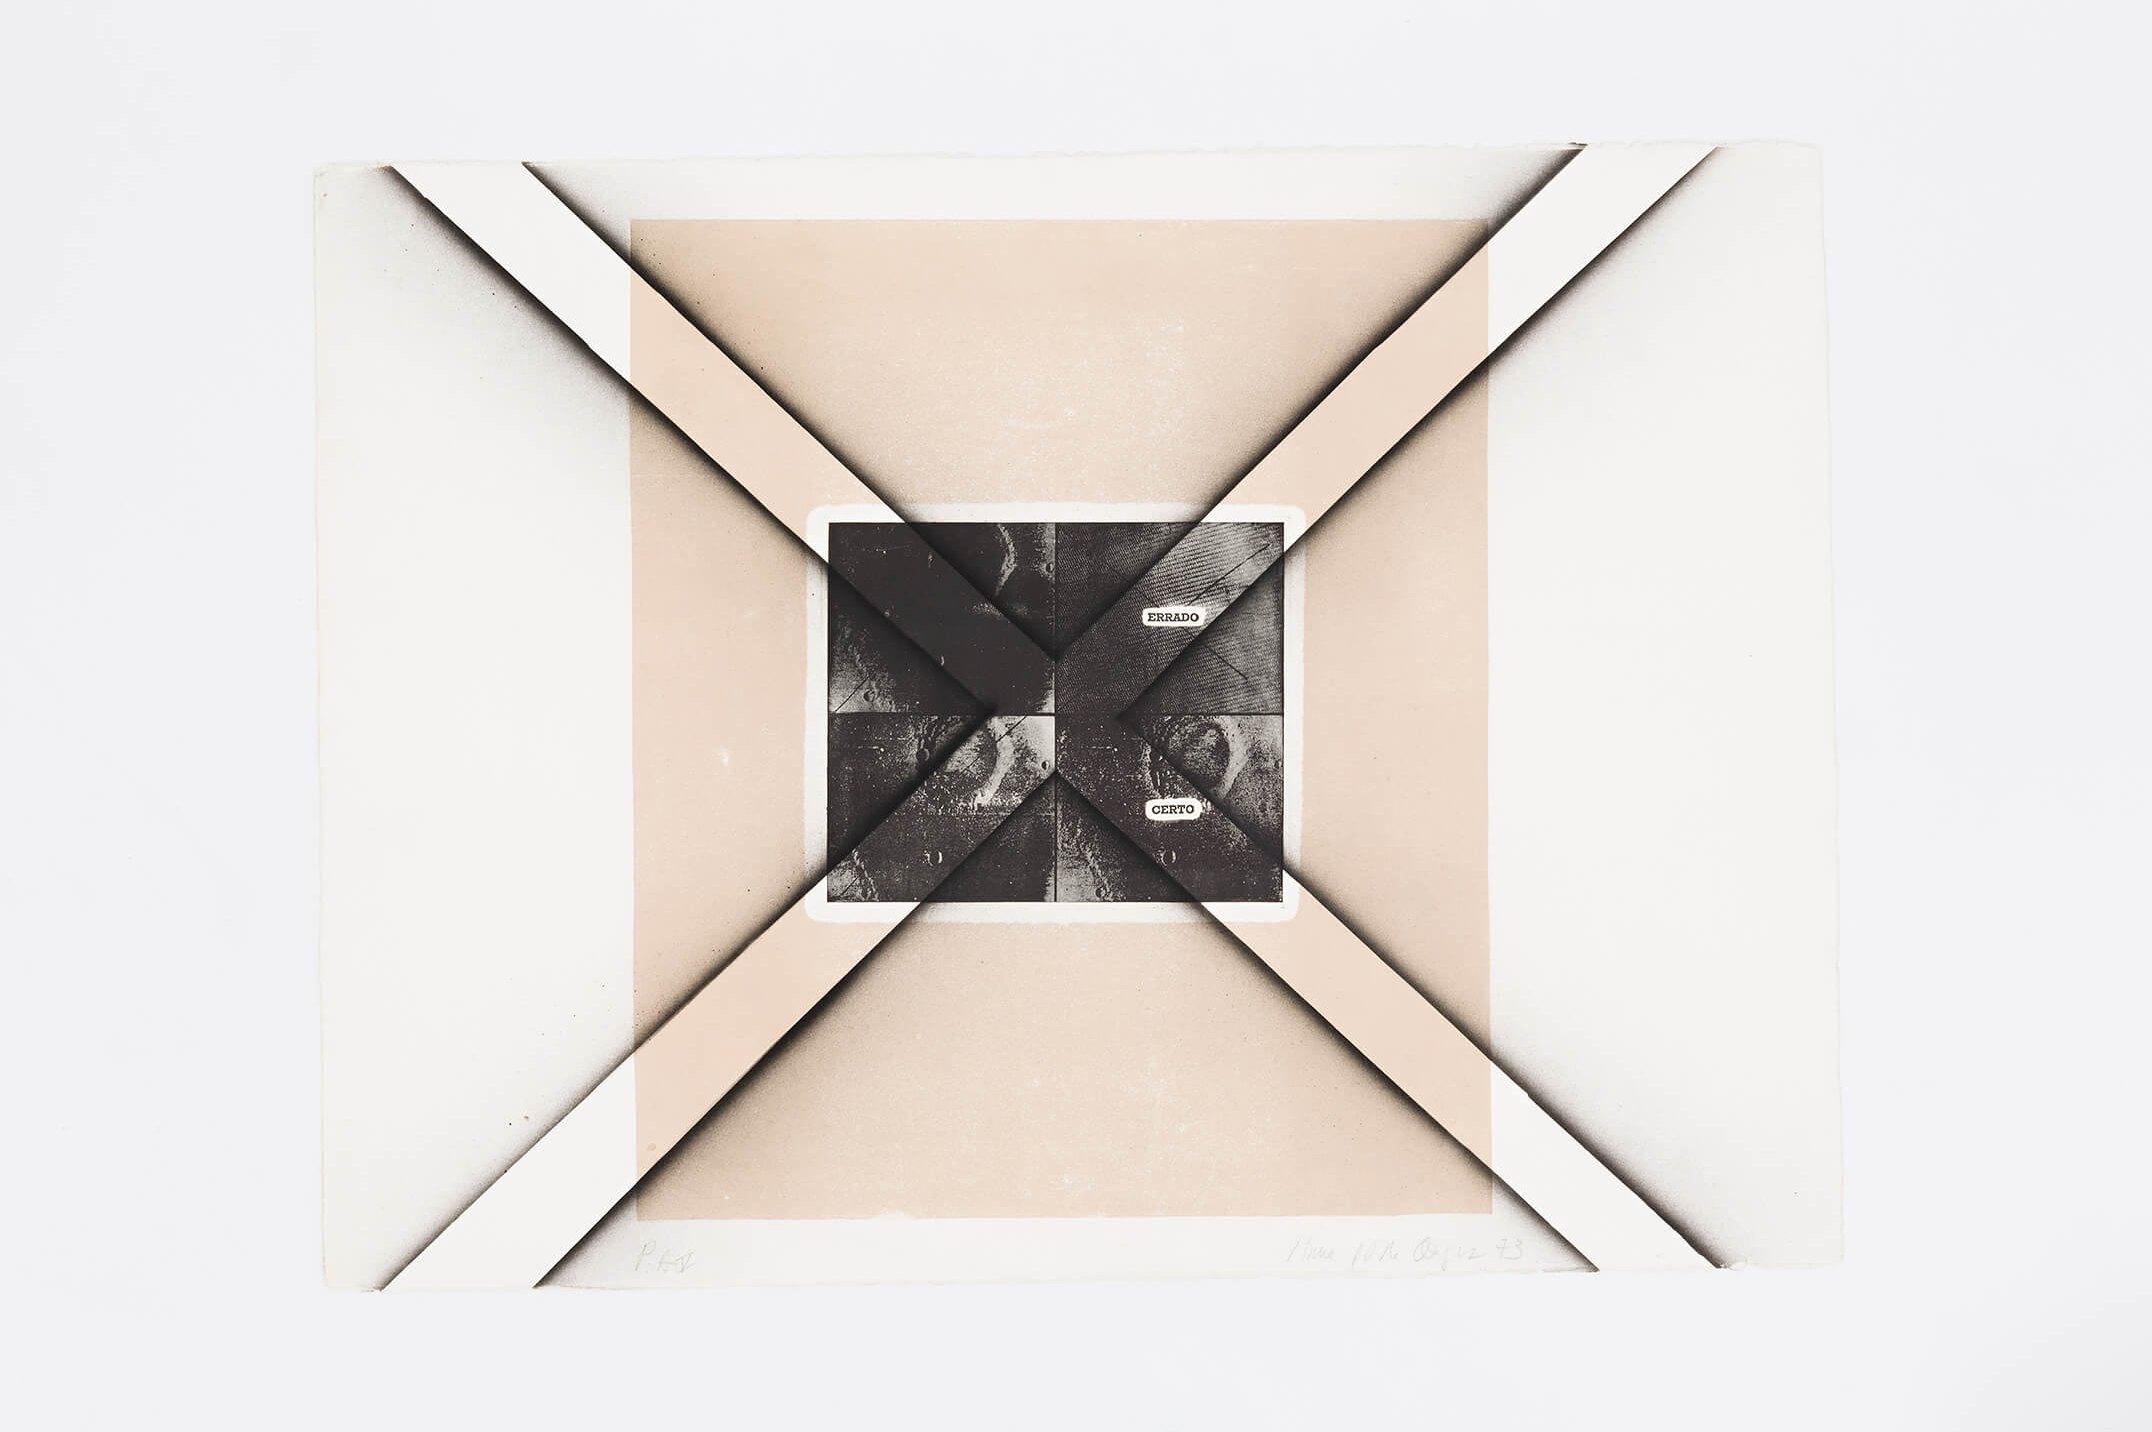 Anna Bella Geiger,<em>Certo-errado, from Polaridades series,</em> 1973,photoengraving on metal and airbrush,55 × 76 cm - Mendes Wood DM